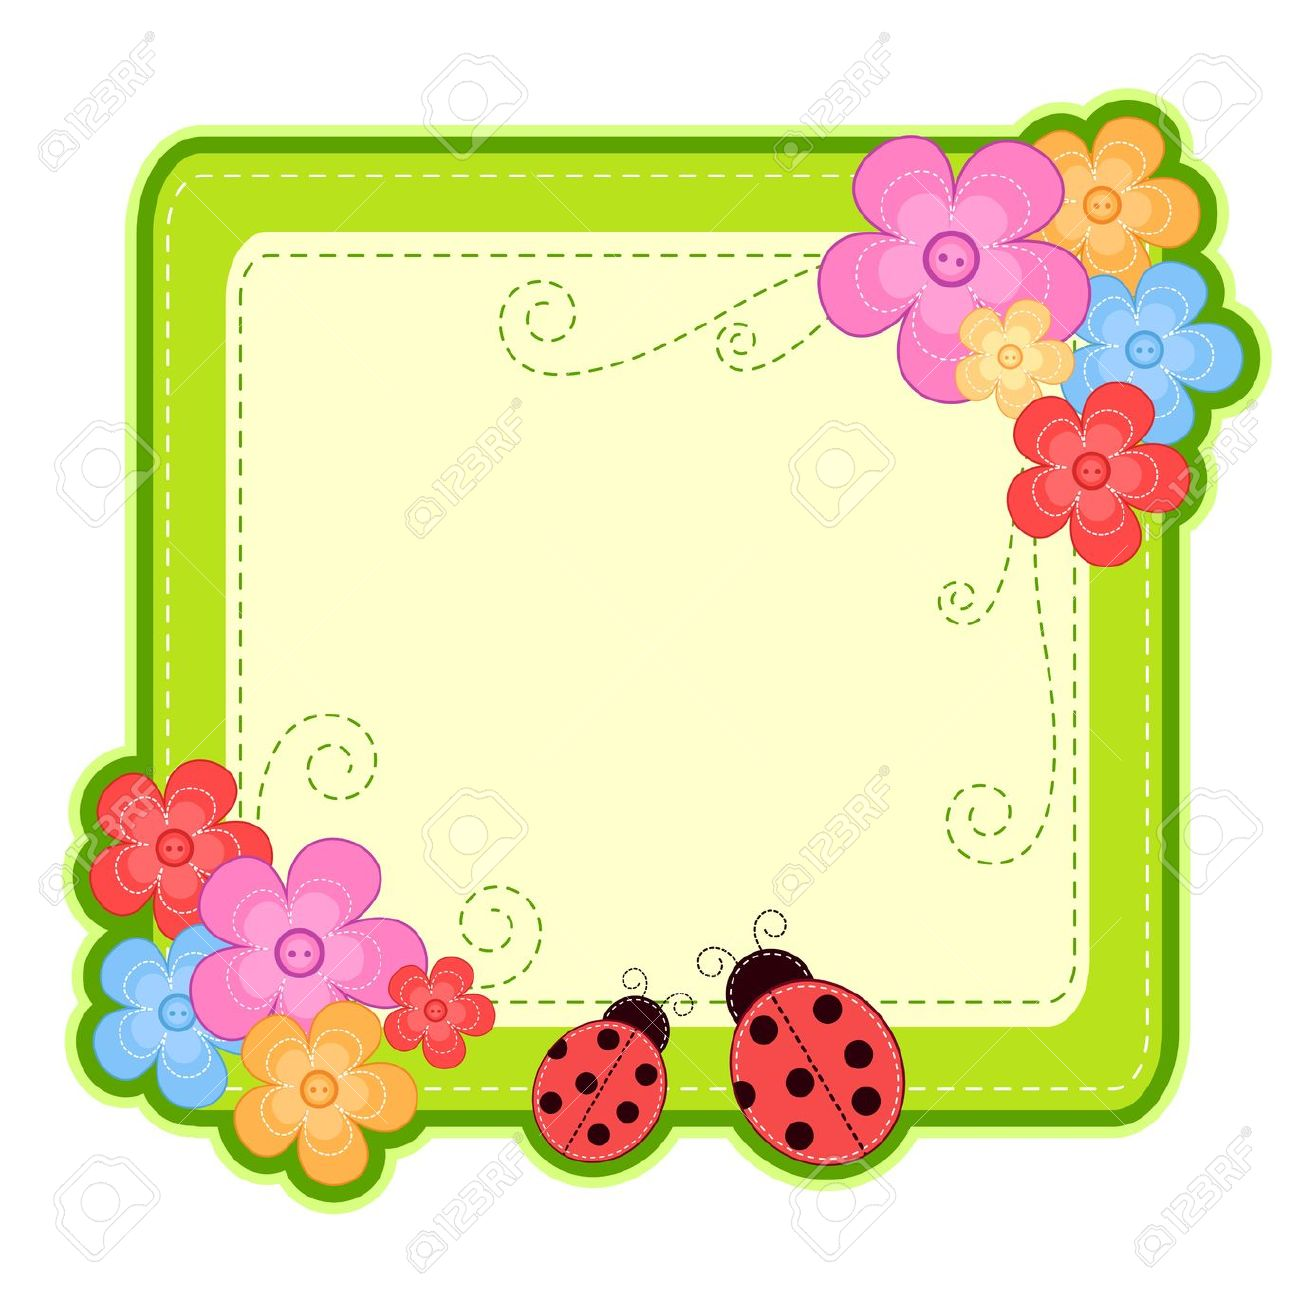 marcos de fotos de flores - Ideal.vistalist.co